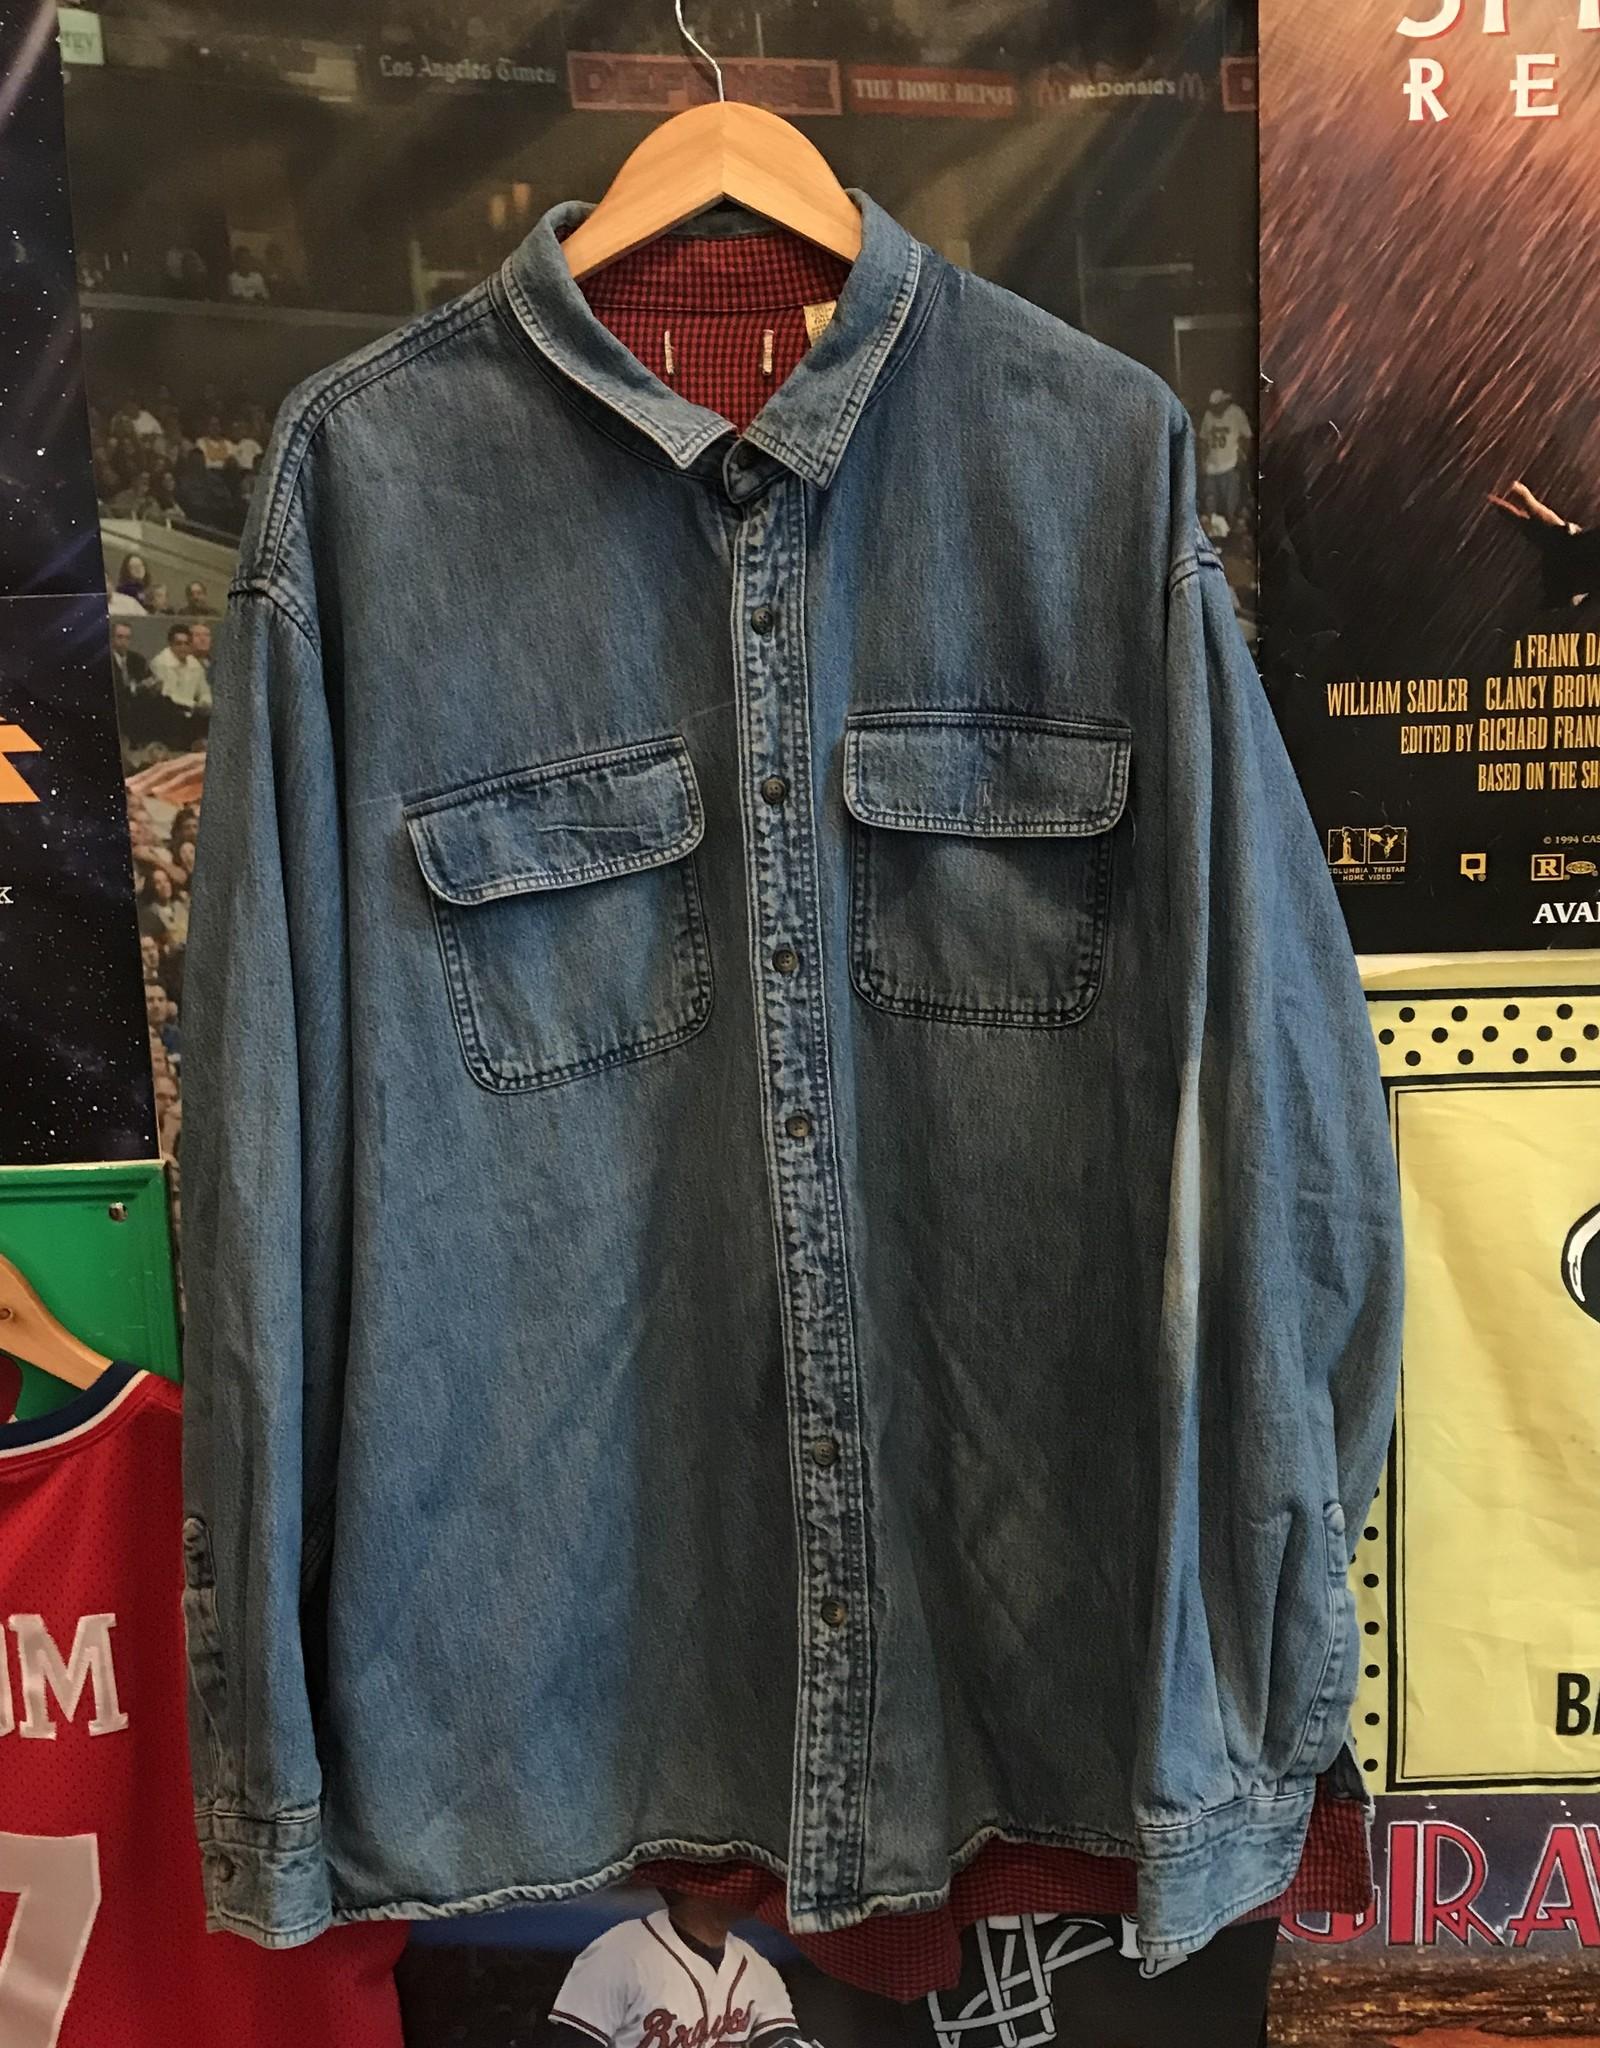 956 denim flannel sz 2XL